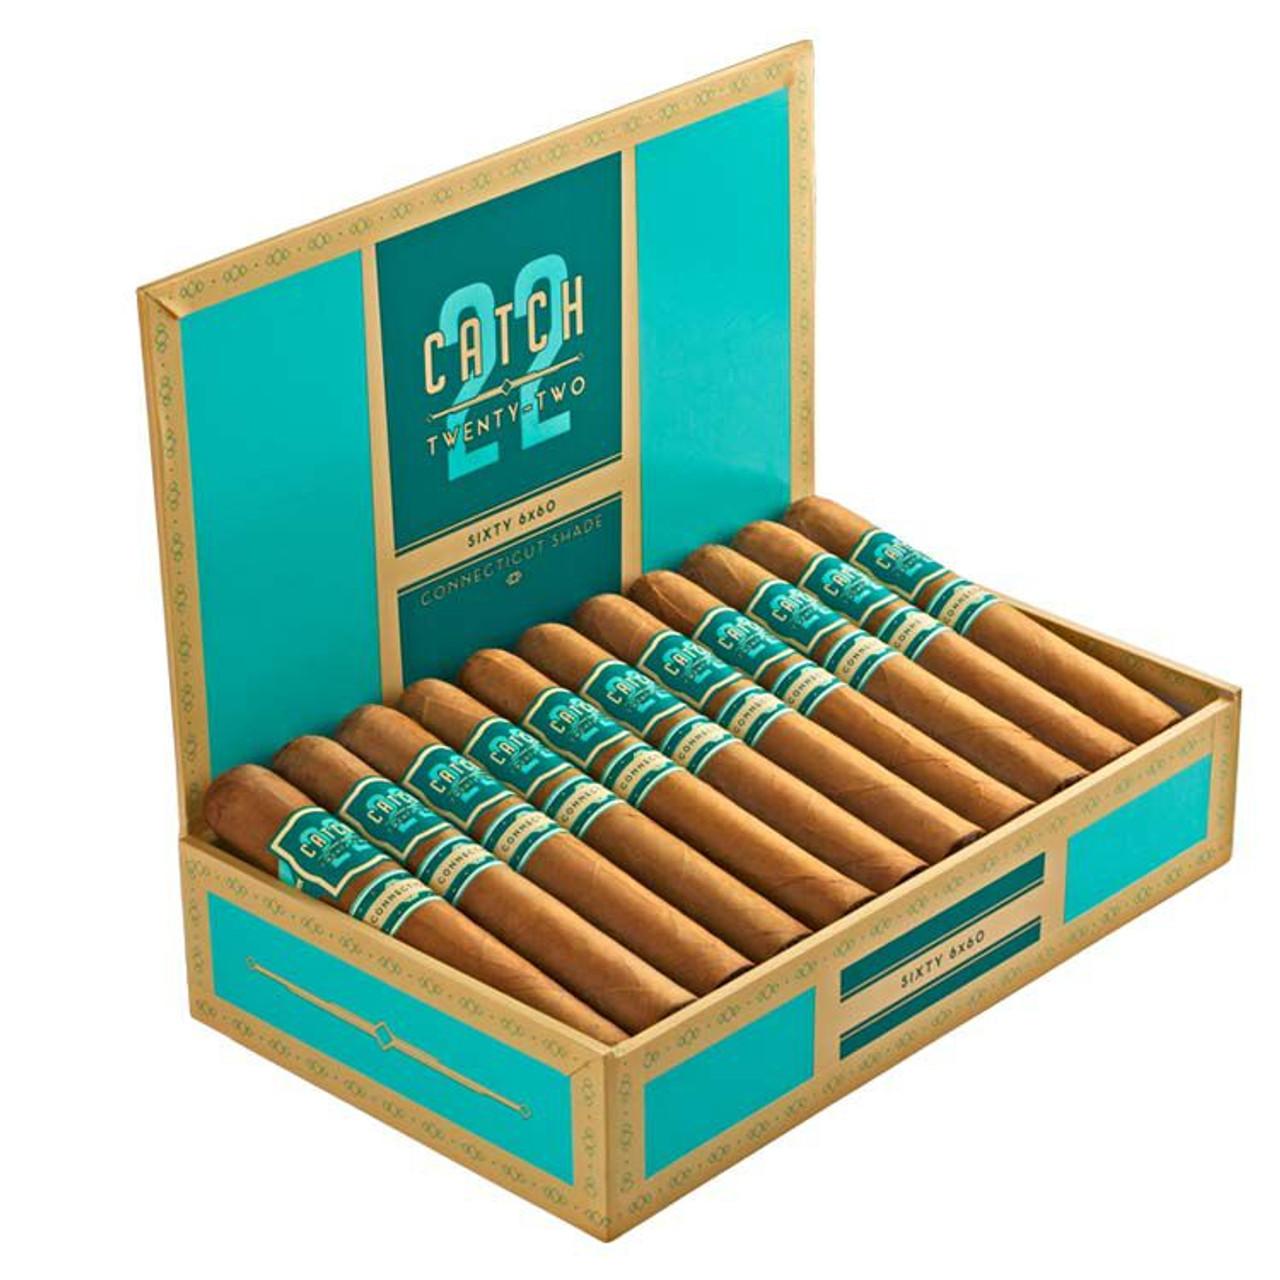 Rocky Patel Catch 22 Connecticut Rothchild Cigars - 4.5 x 50 (Box of 22)